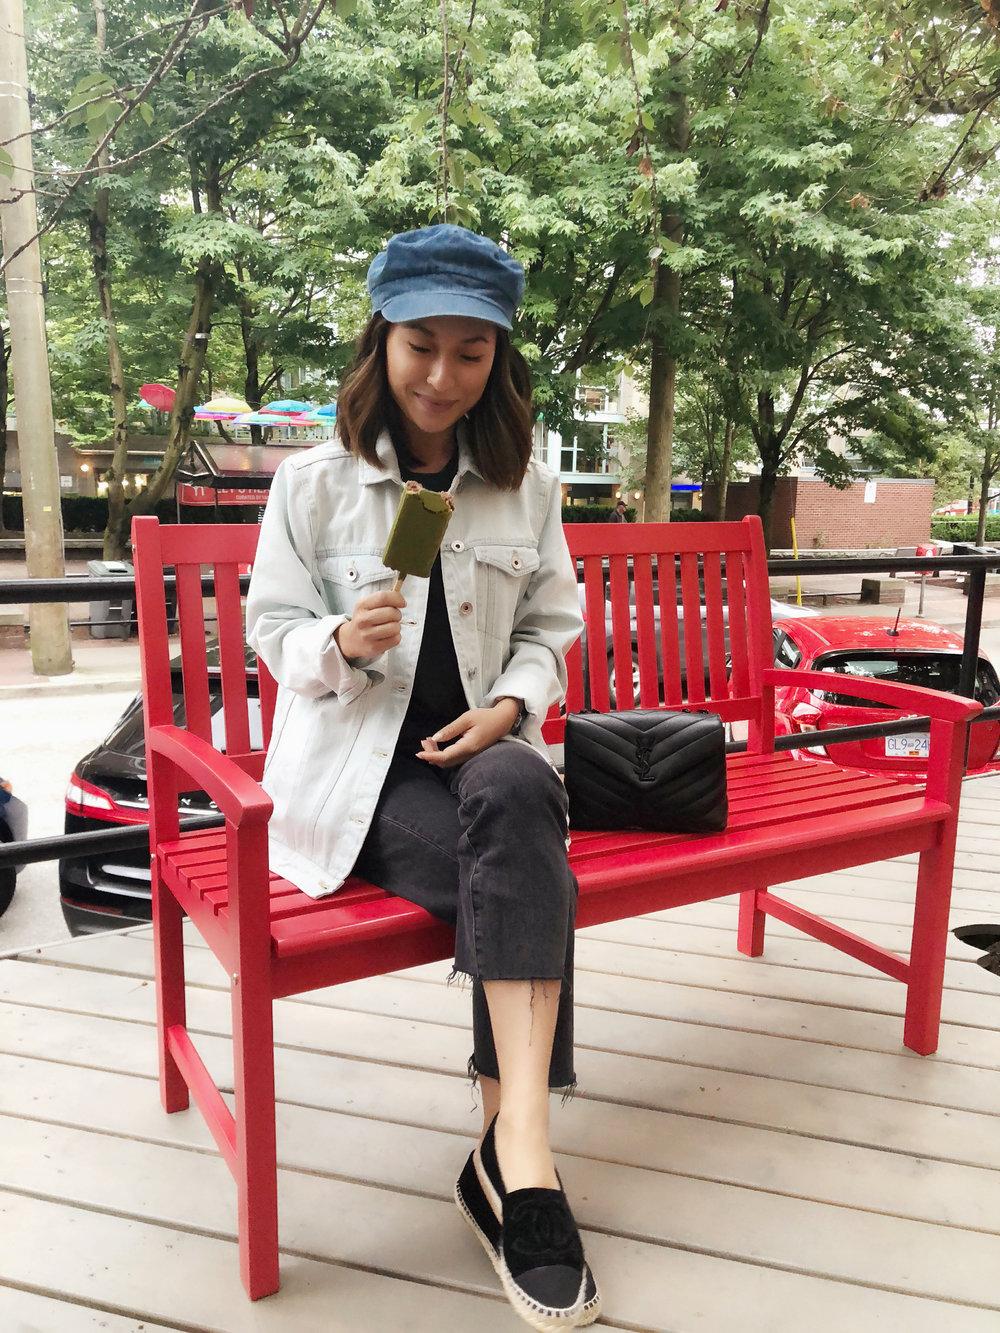 denim on denim - Hat: TopshopJacket: Frank & OakJeans: Levi'sShoes: ChanelBag: Saint Laurent